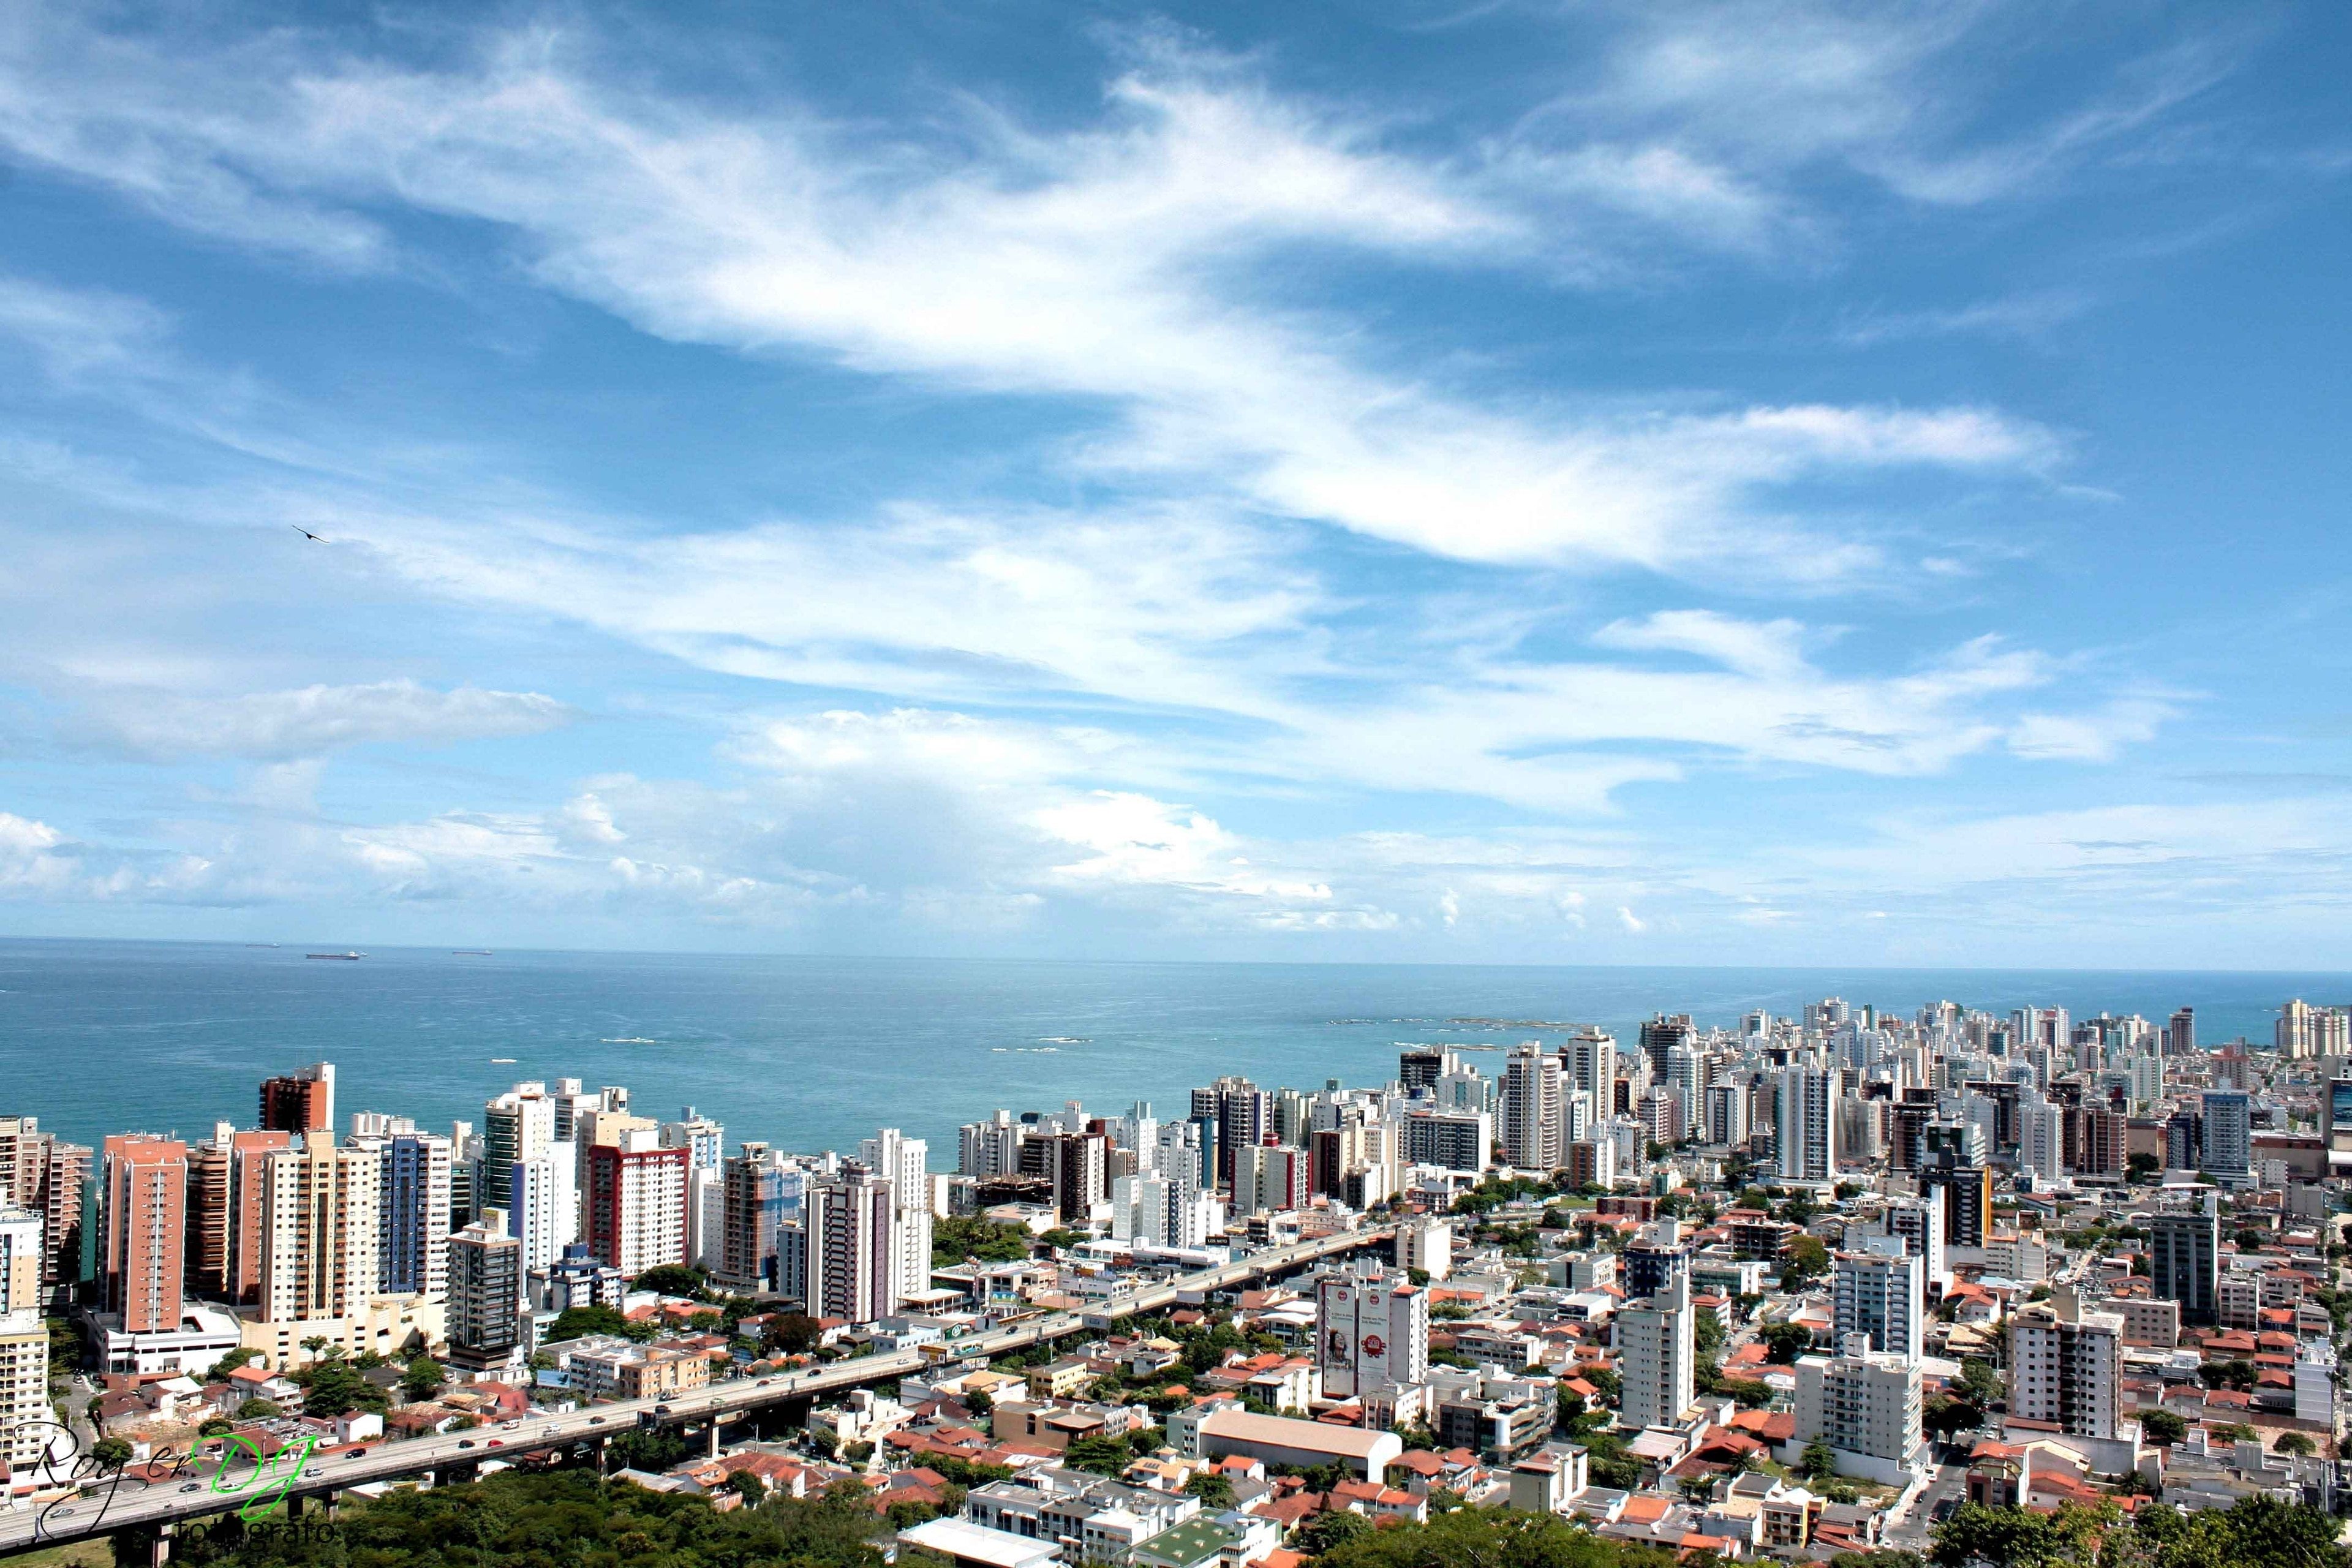 Vila Velha, Bundesstaat Espírito Santo, Brasilien